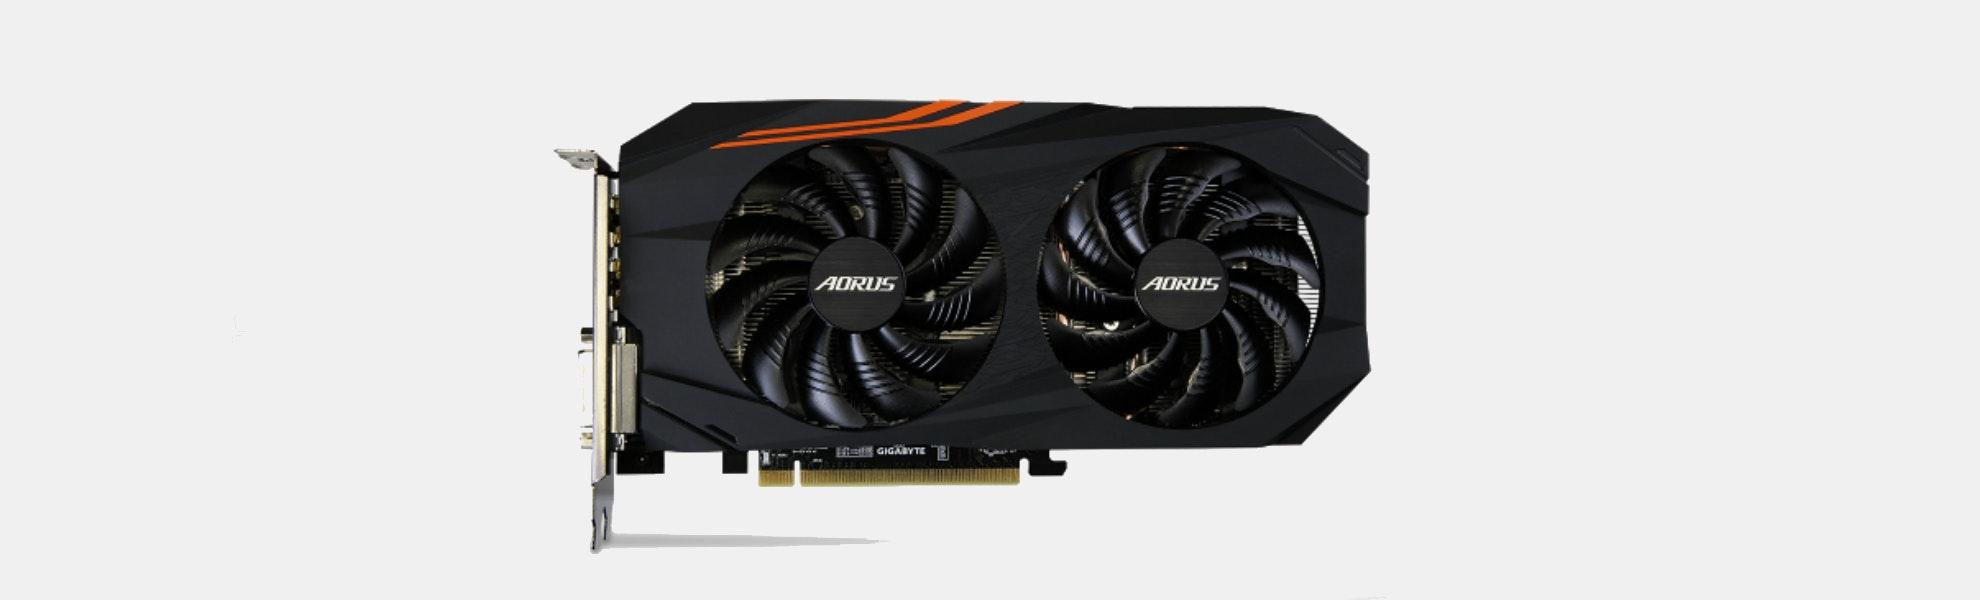 AORUS Radeon RX580 8G Graphics Card